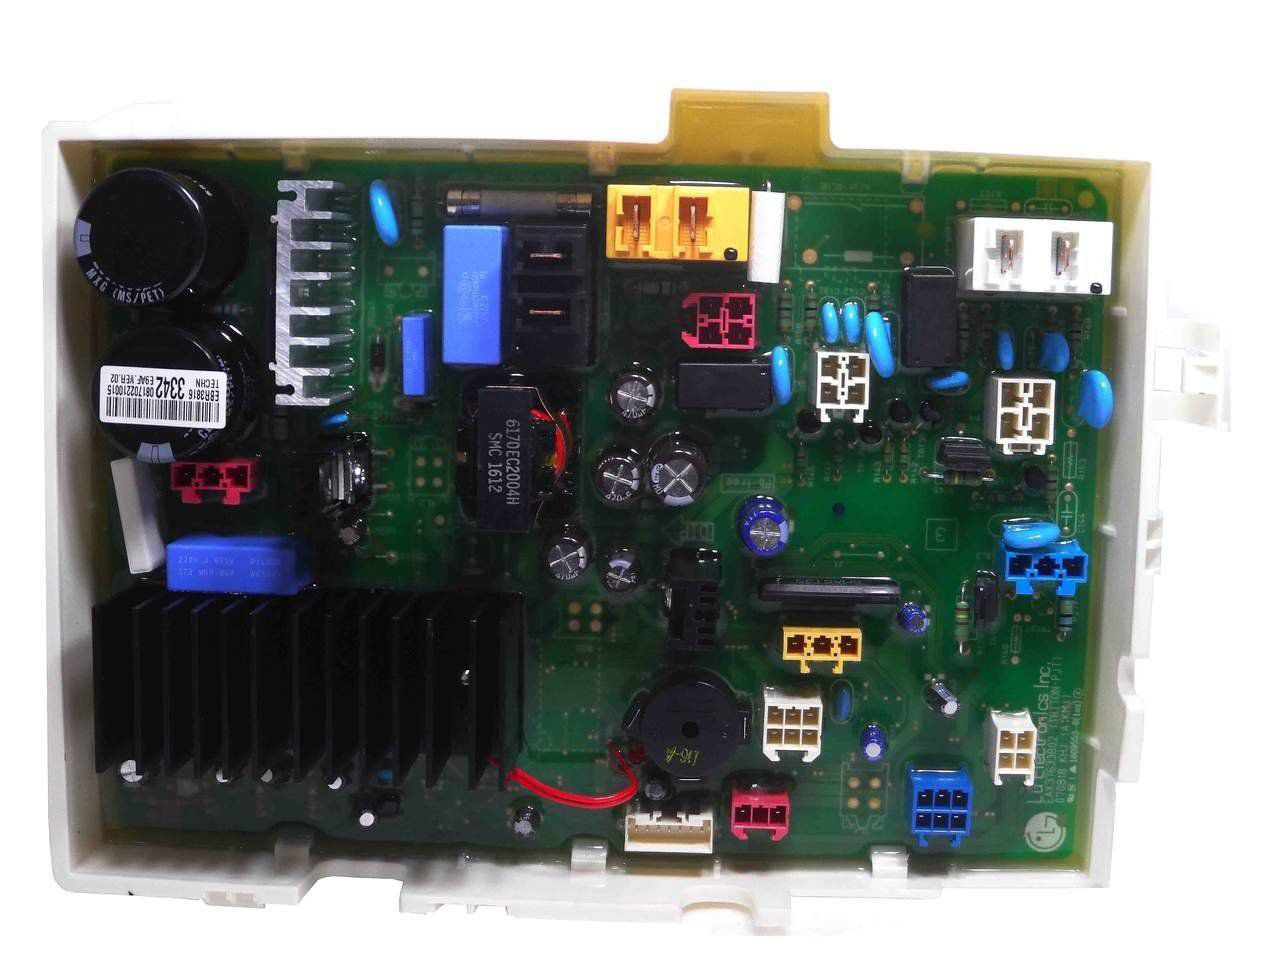 PLACA PRINCIPAL LAVA SECA LG 127V WD13436RD EBR38163342.